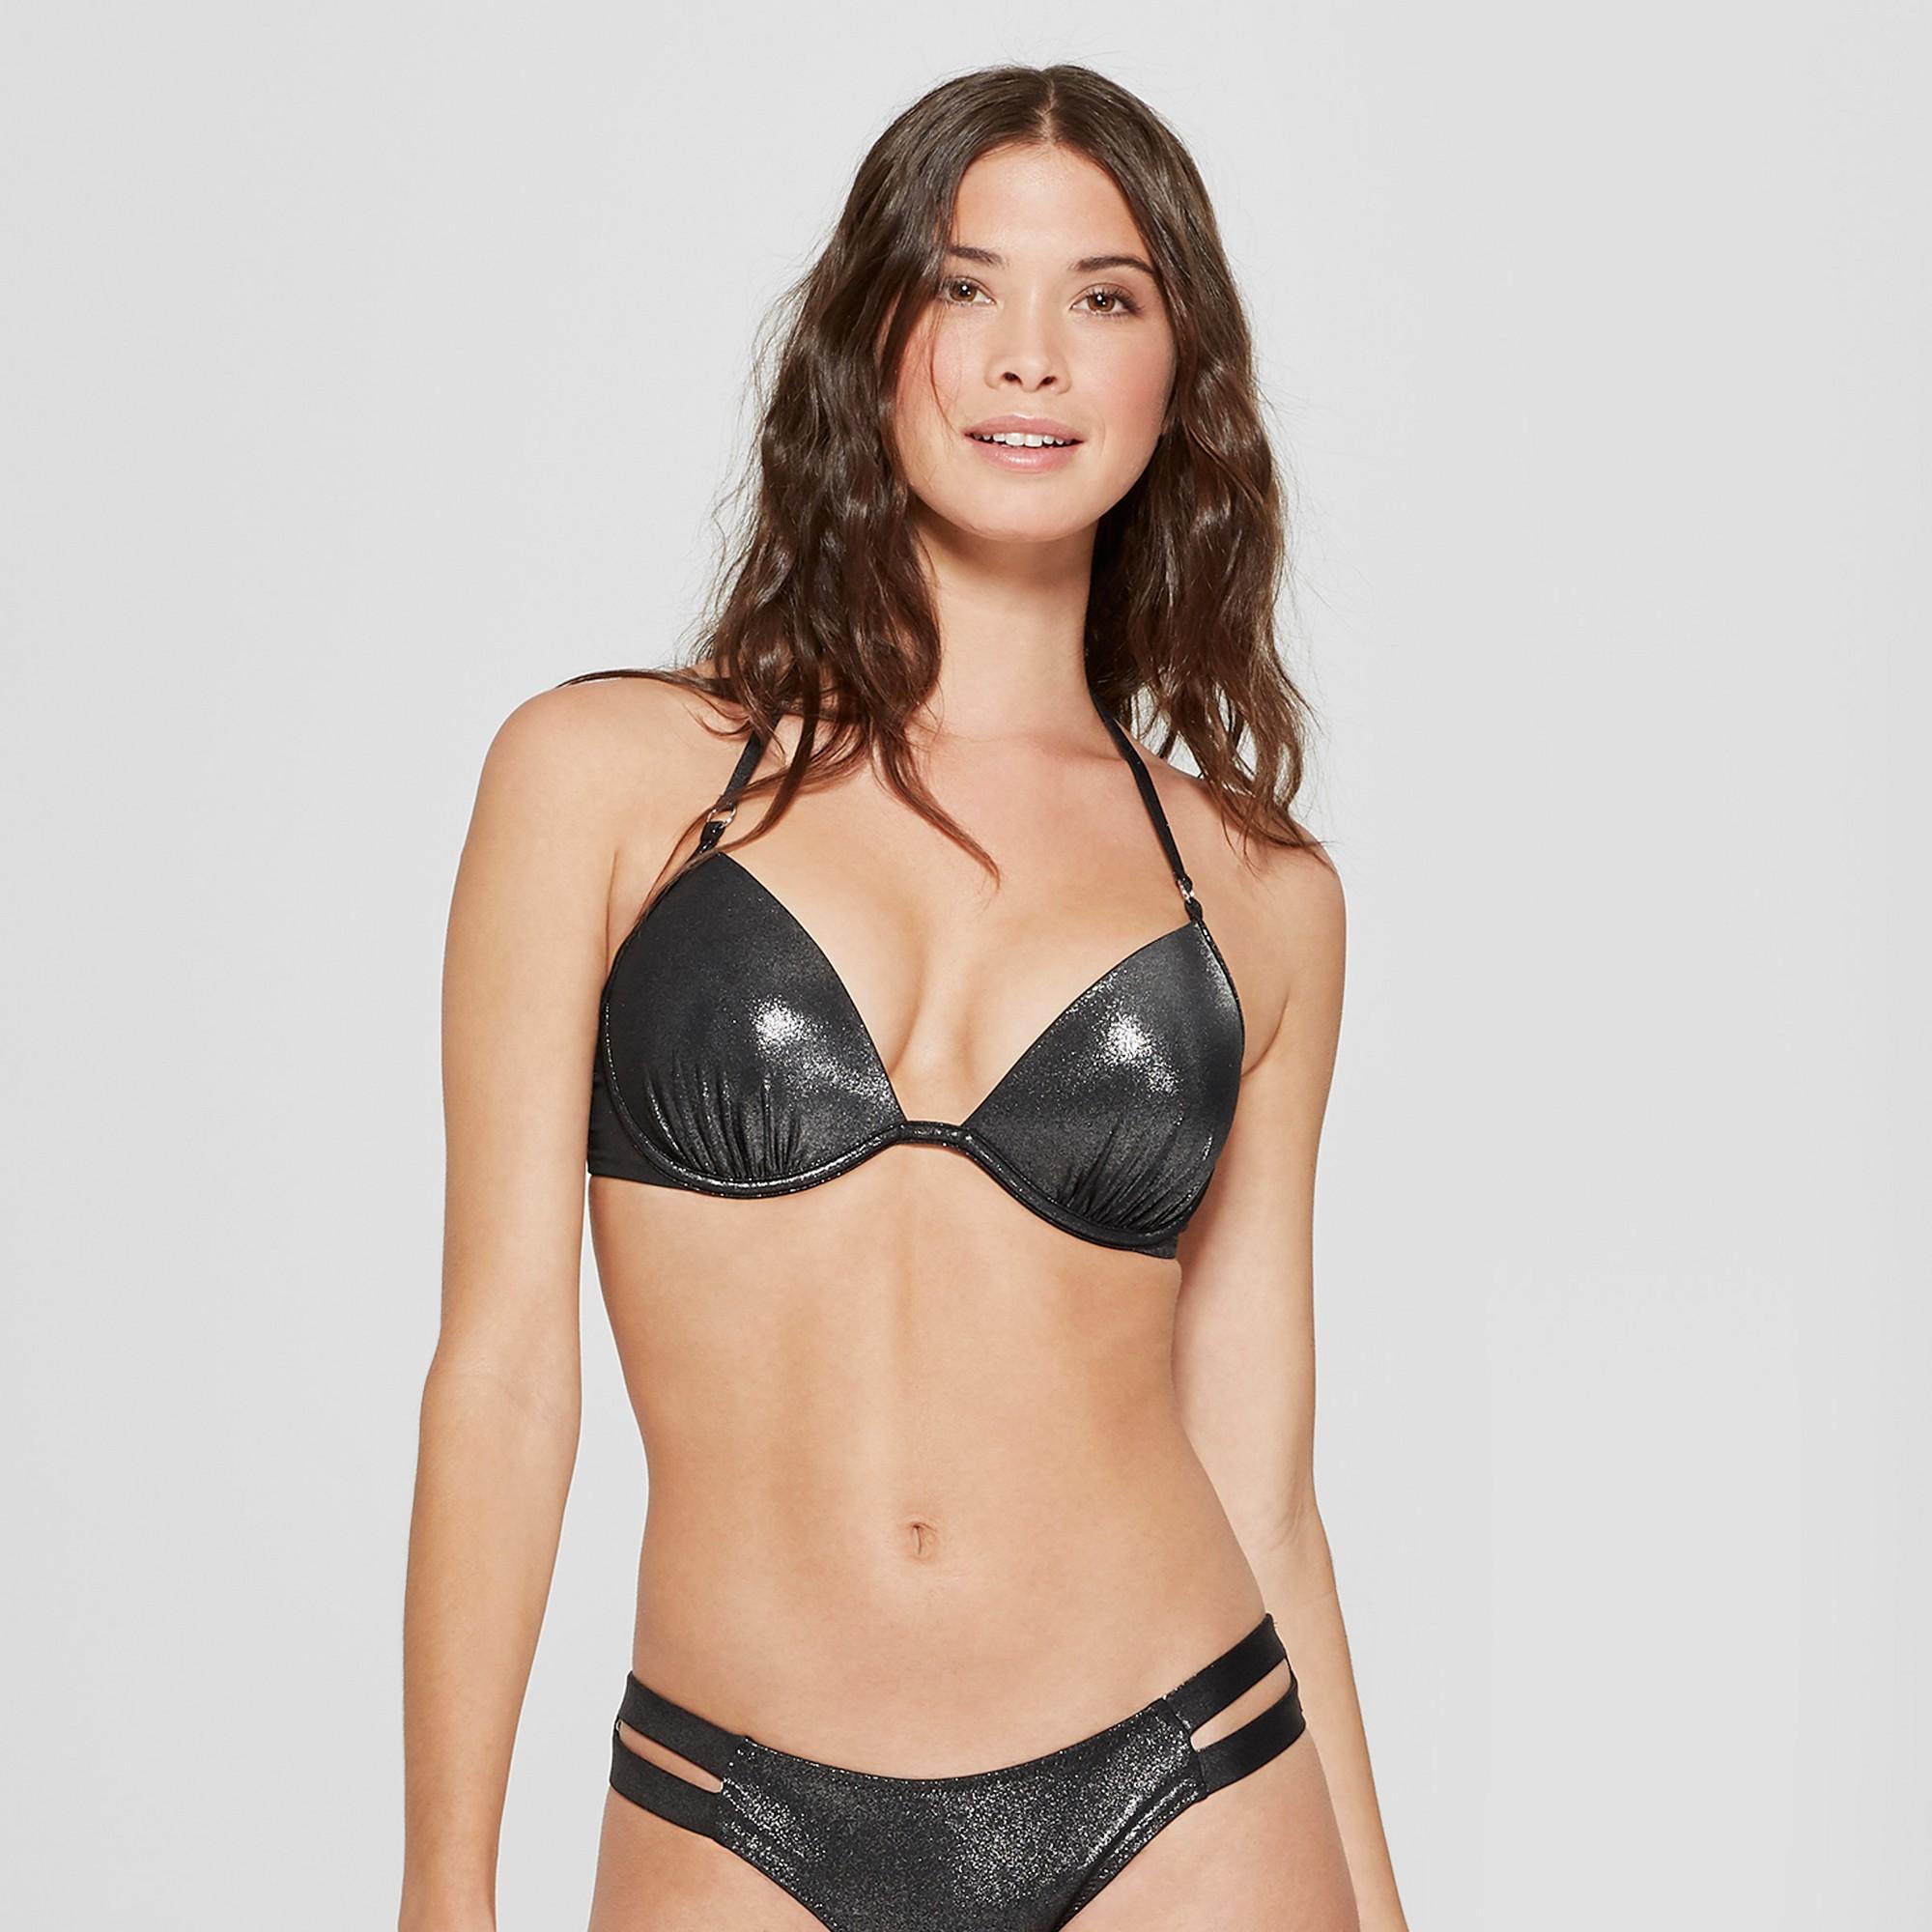 5cbe028a01e0de Women's Shore Light Lift Halter Metallic Bikini Top - Shade & Shore Silver  Foil 34DDD